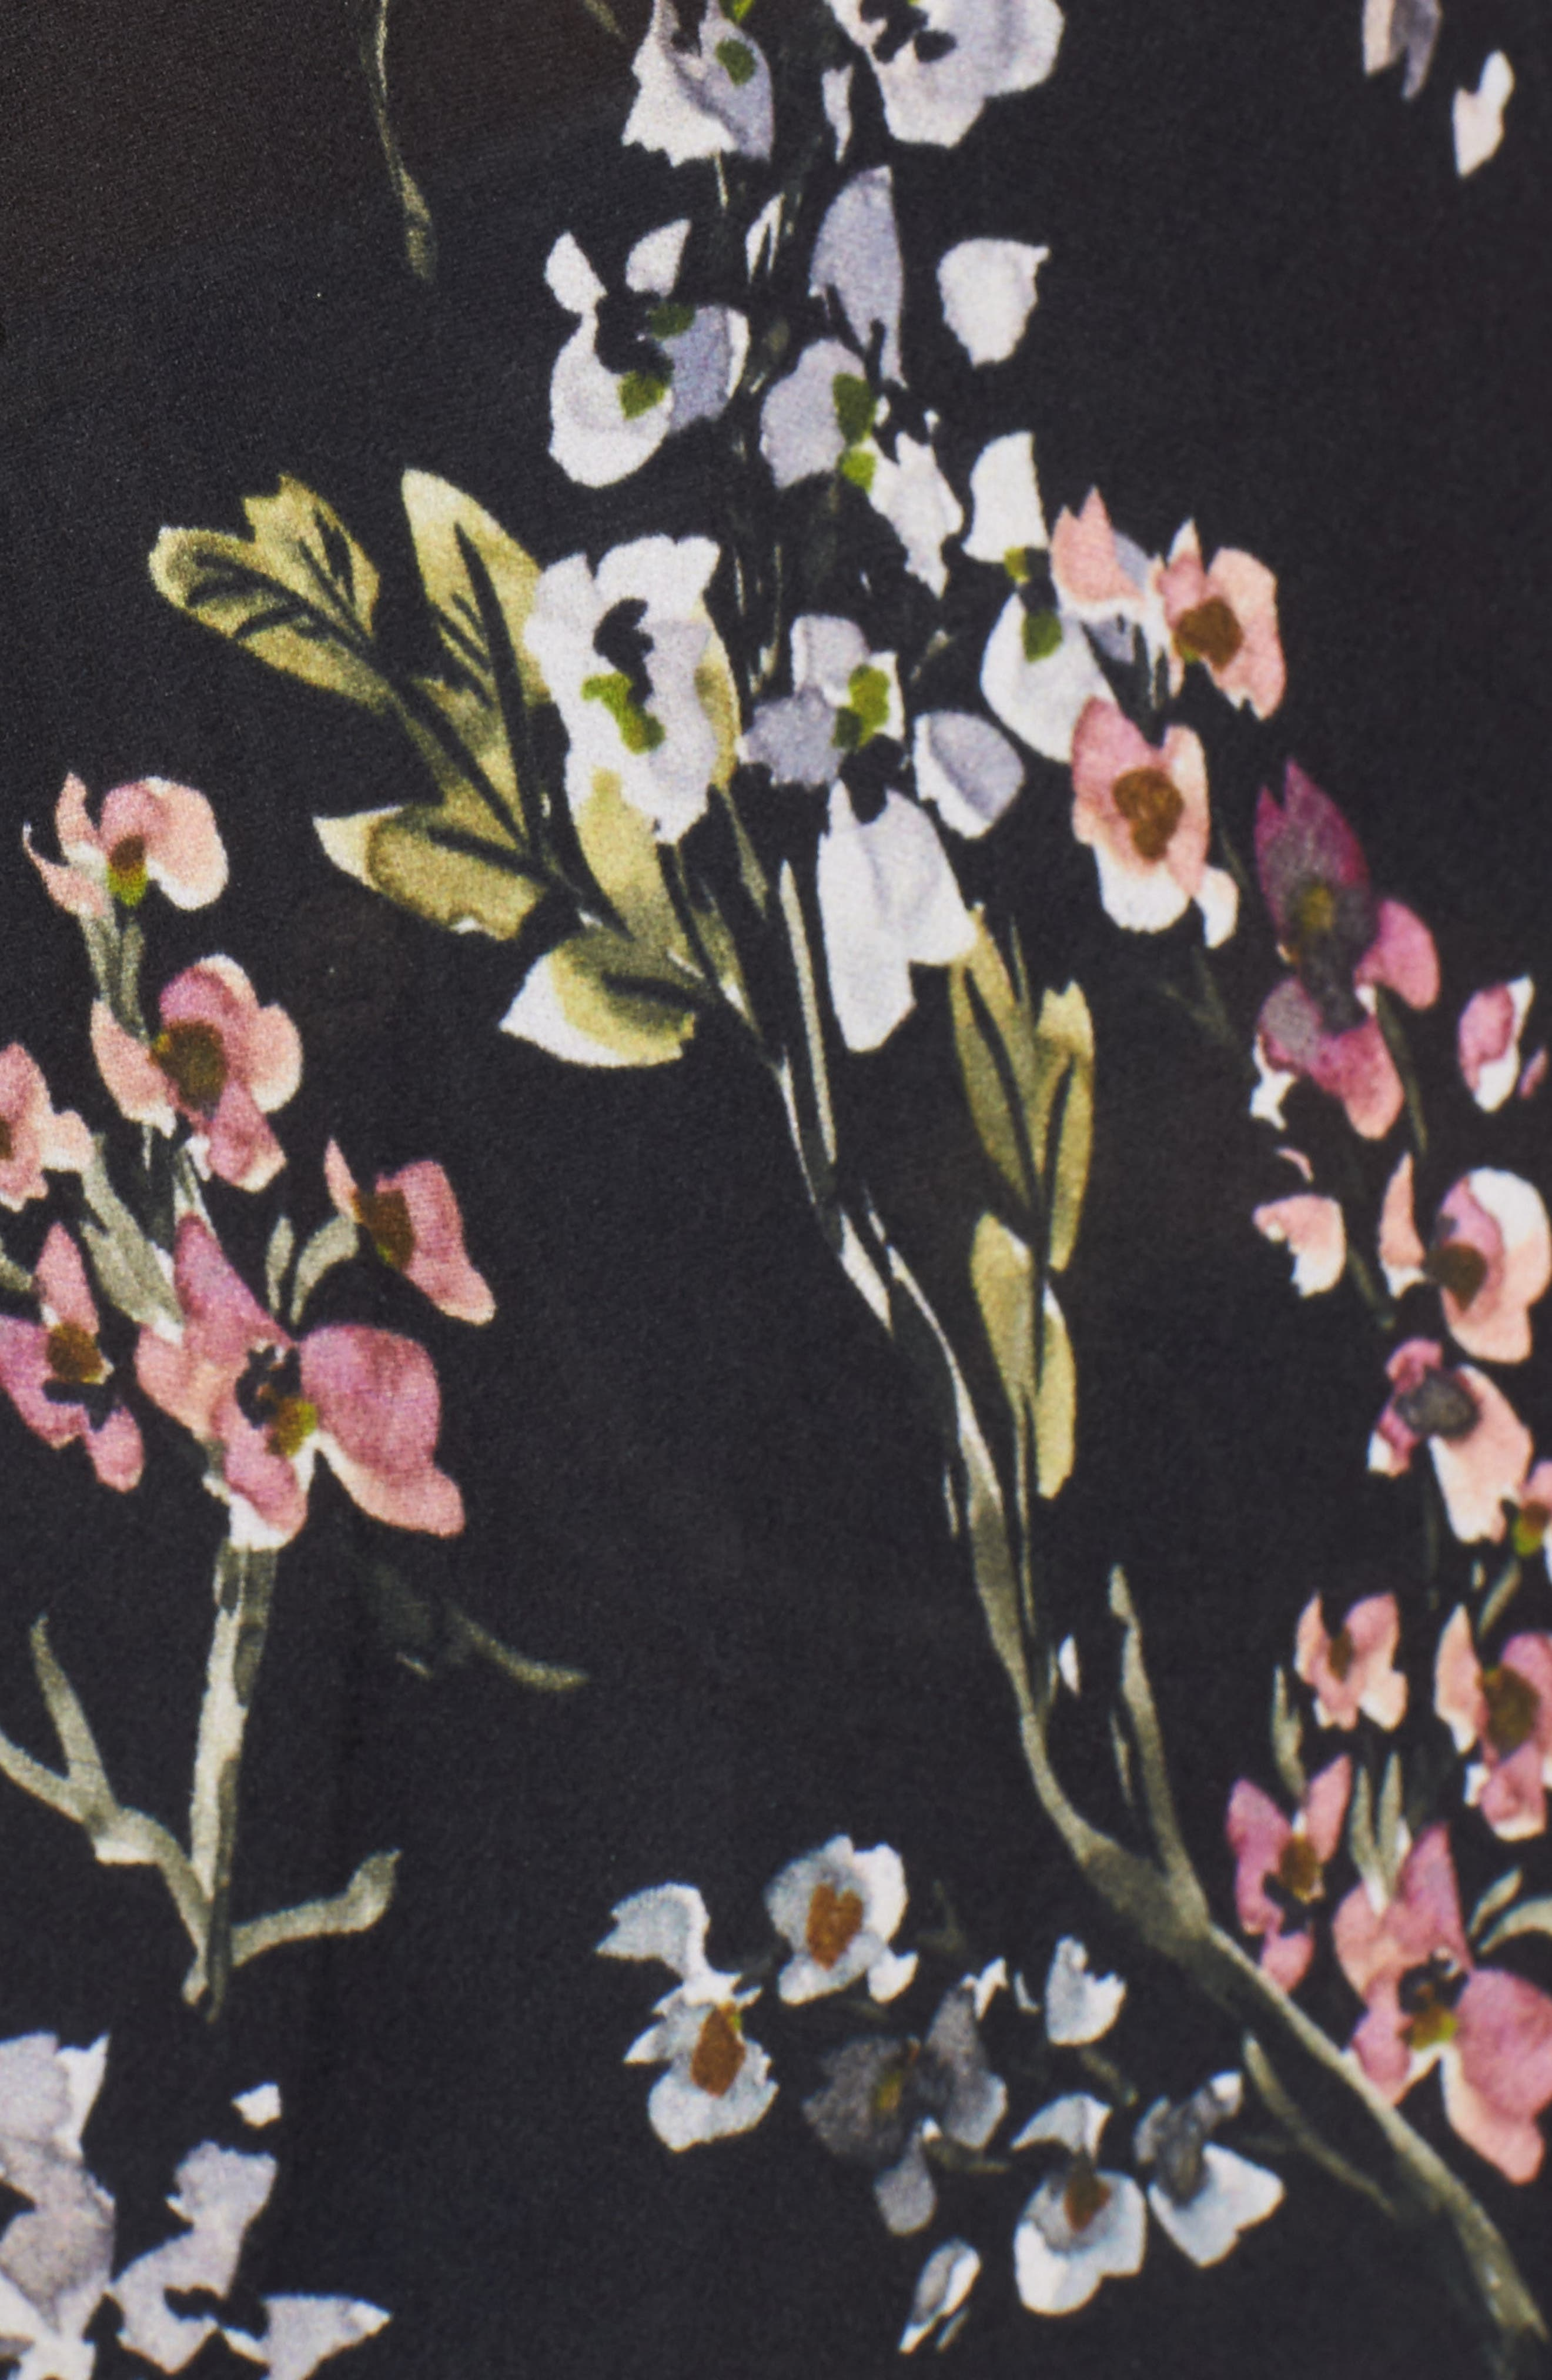 Connery Silk Blouse,                             Alternate thumbnail 9, color,